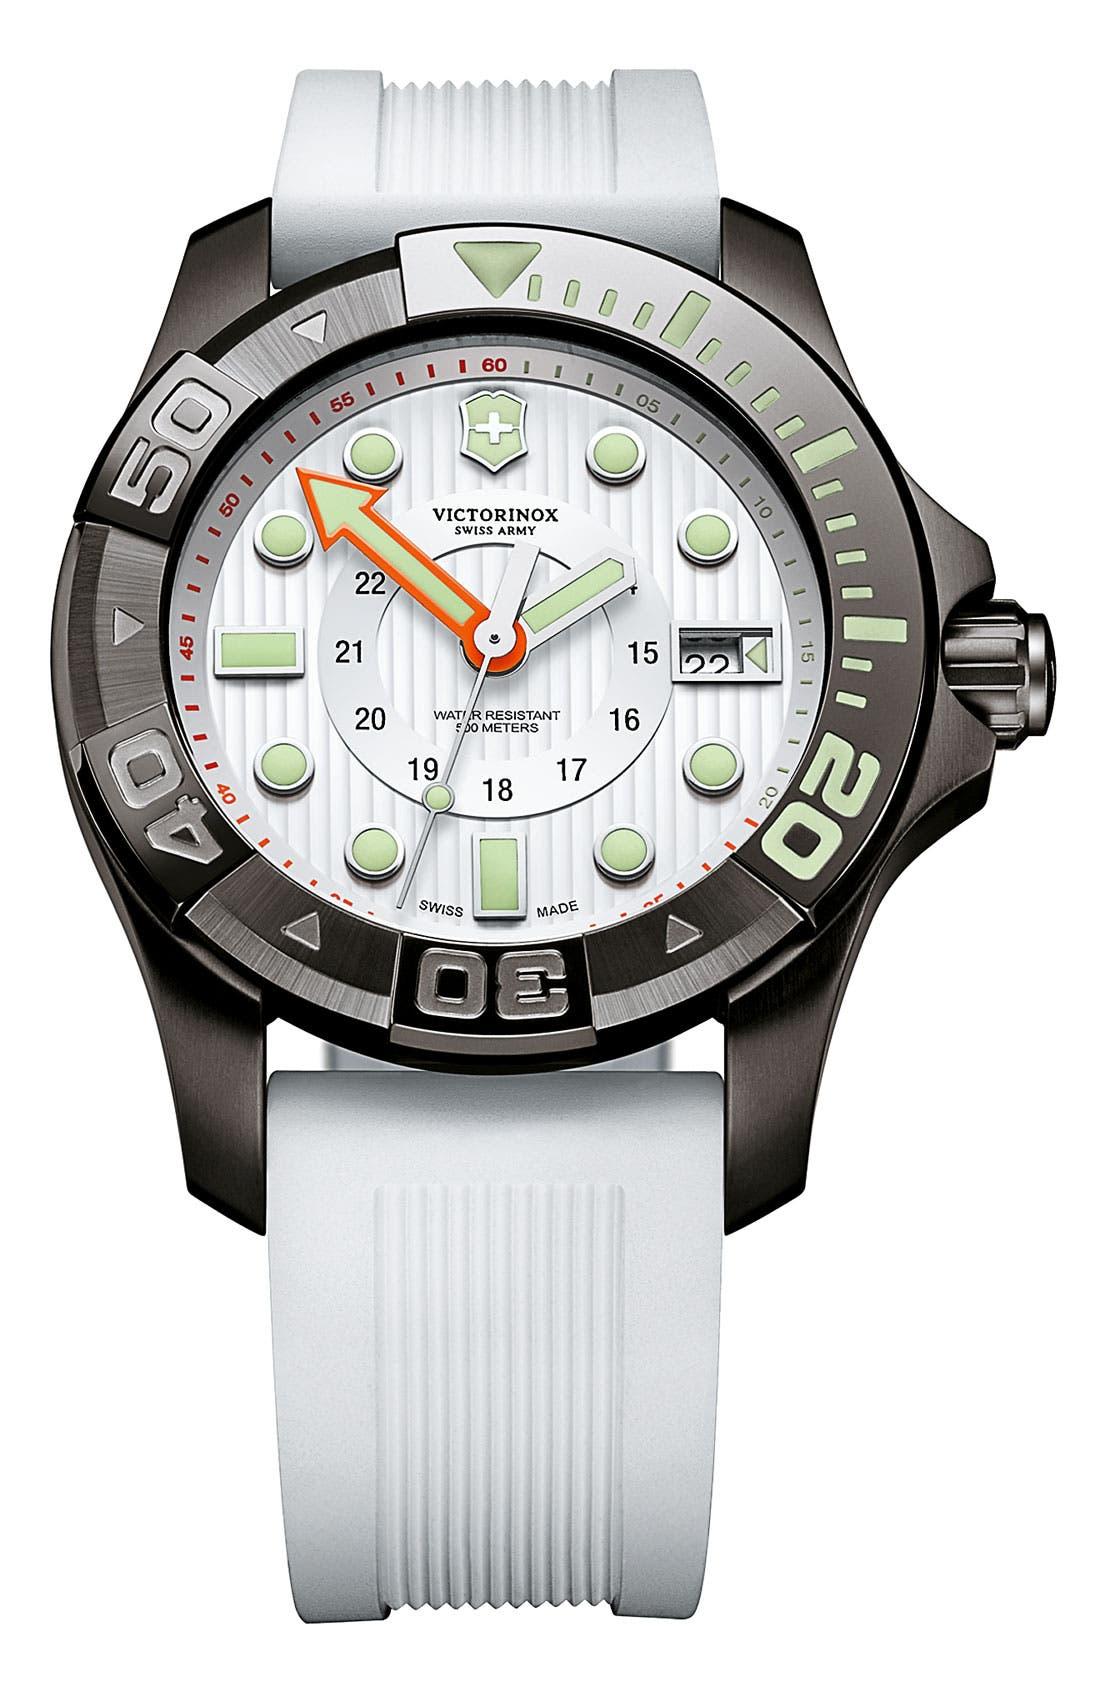 Alternate Image 1 Selected - Victorinox Swiss Army® 'Dive Master' Gunmetal Strap Watch, 43mm